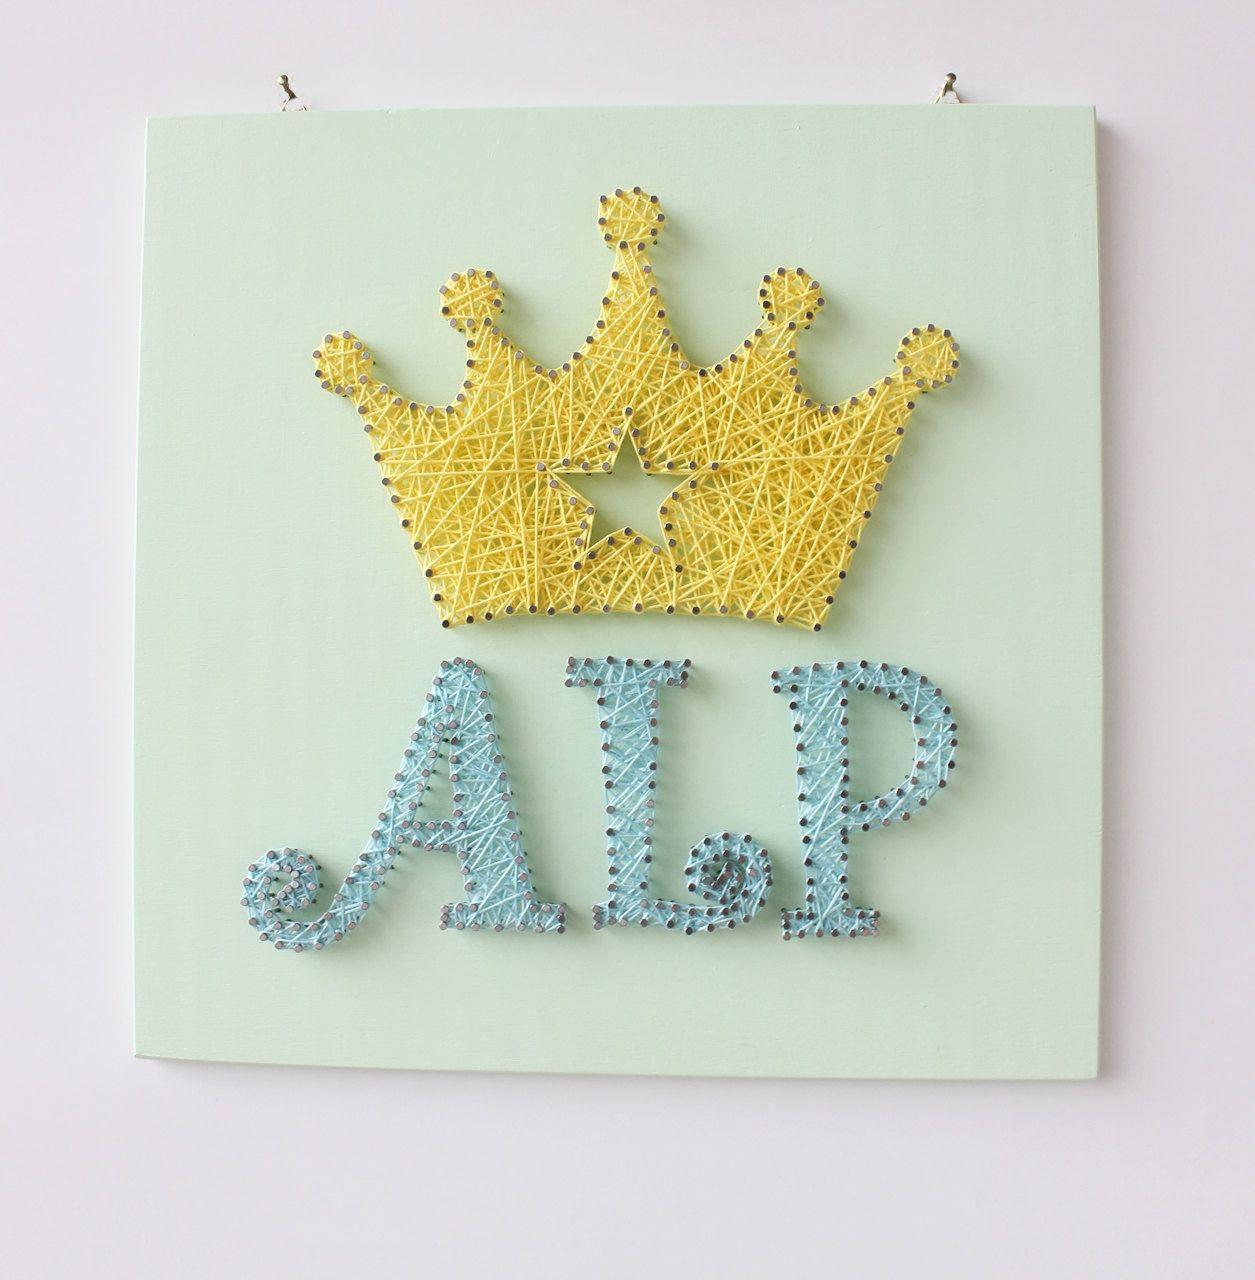 Nursery Wall Art, Baby Gift, Personalized Nursery Decor ...